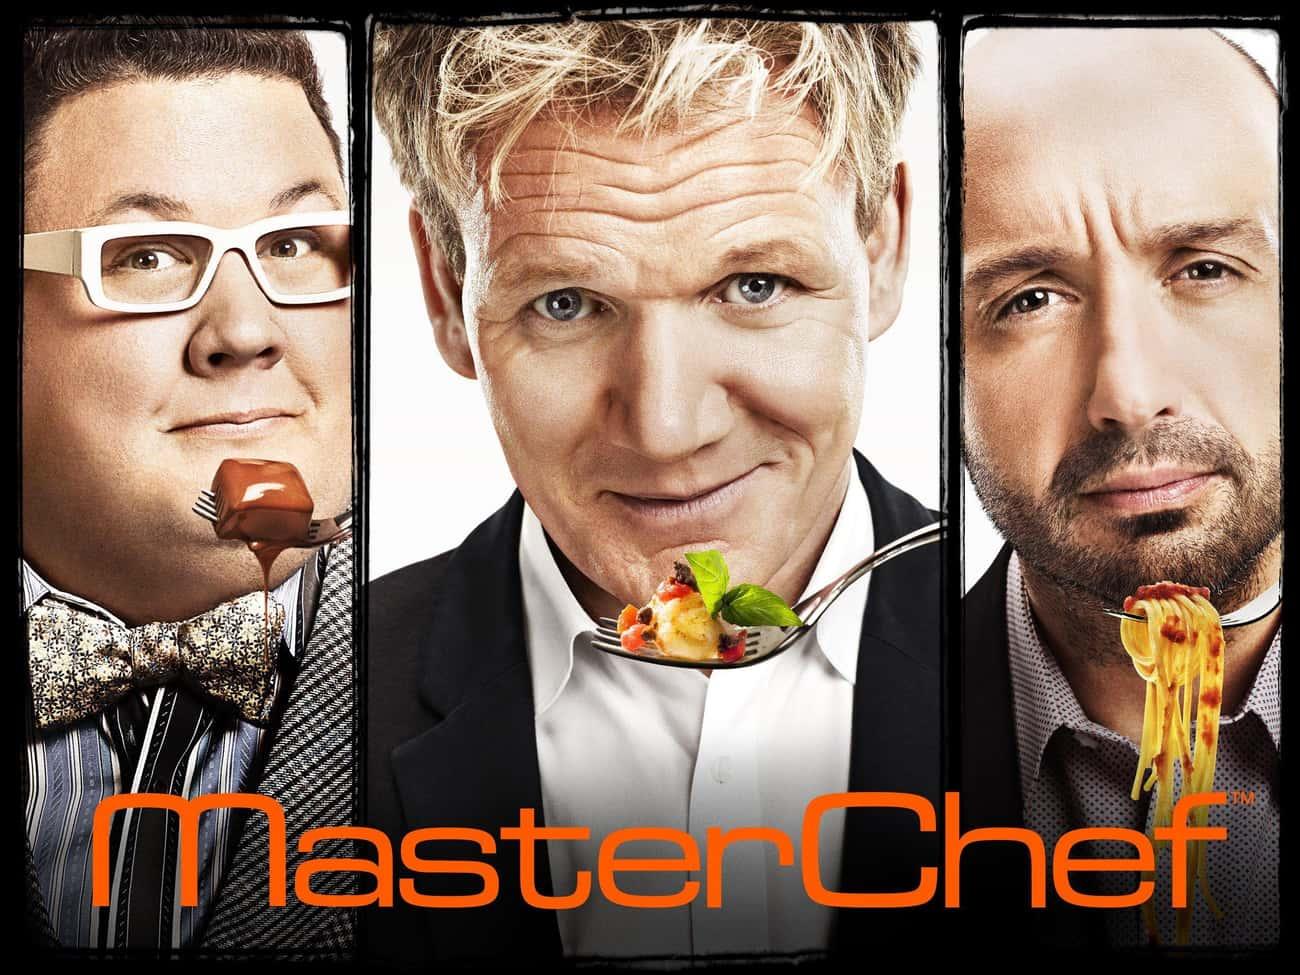 MasterChef - Season 4 is listed (or ranked) 2 on the list The Best Seasons of 'MasterChef' (U.S.)